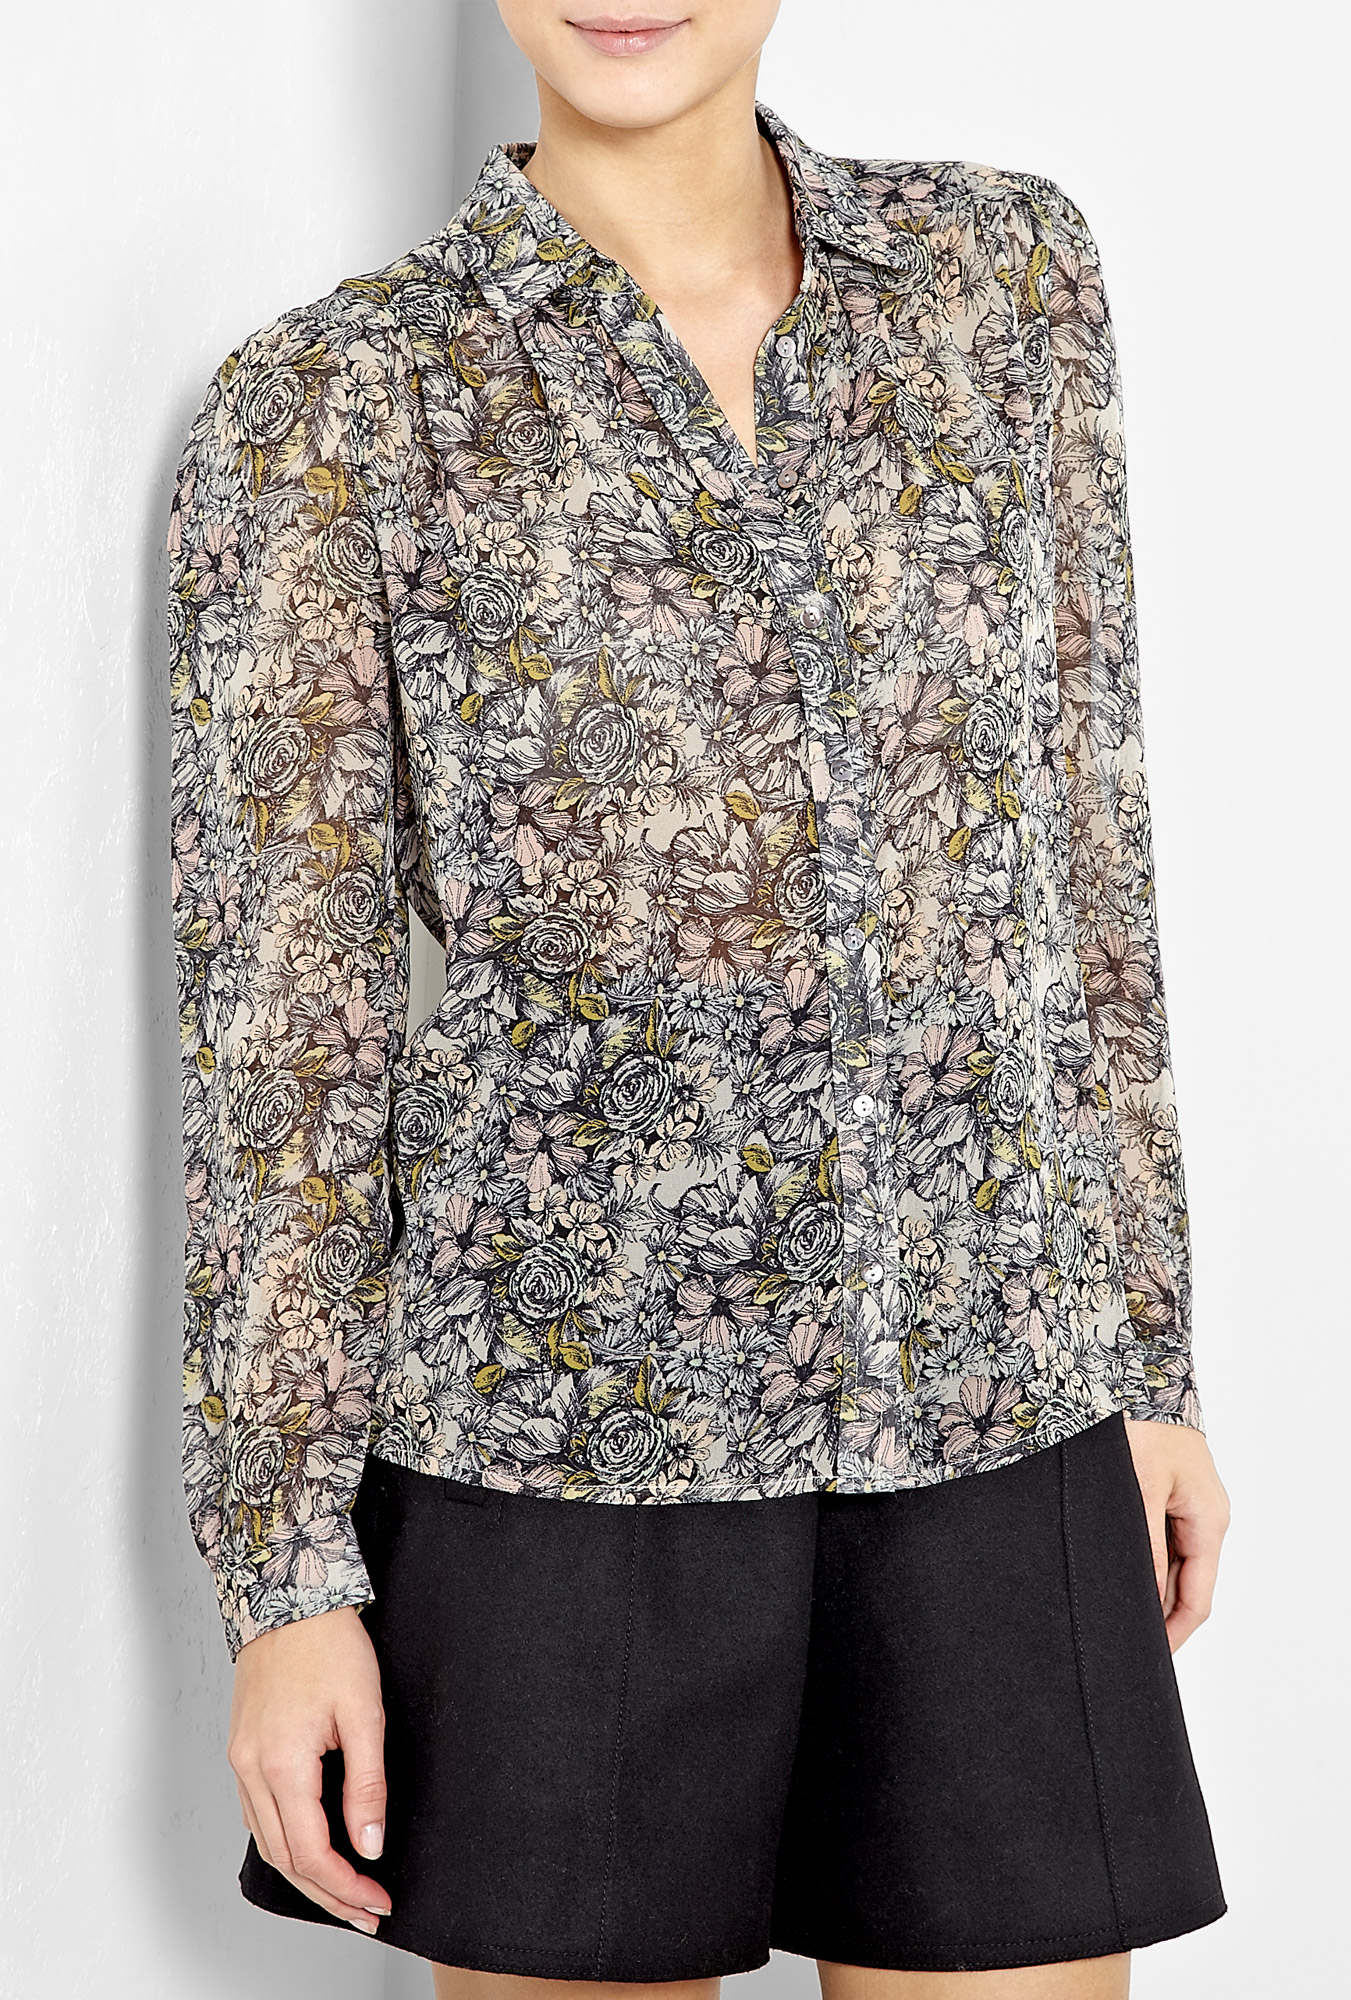 paul joe sister flavien floral printed silk shirt in. Black Bedroom Furniture Sets. Home Design Ideas